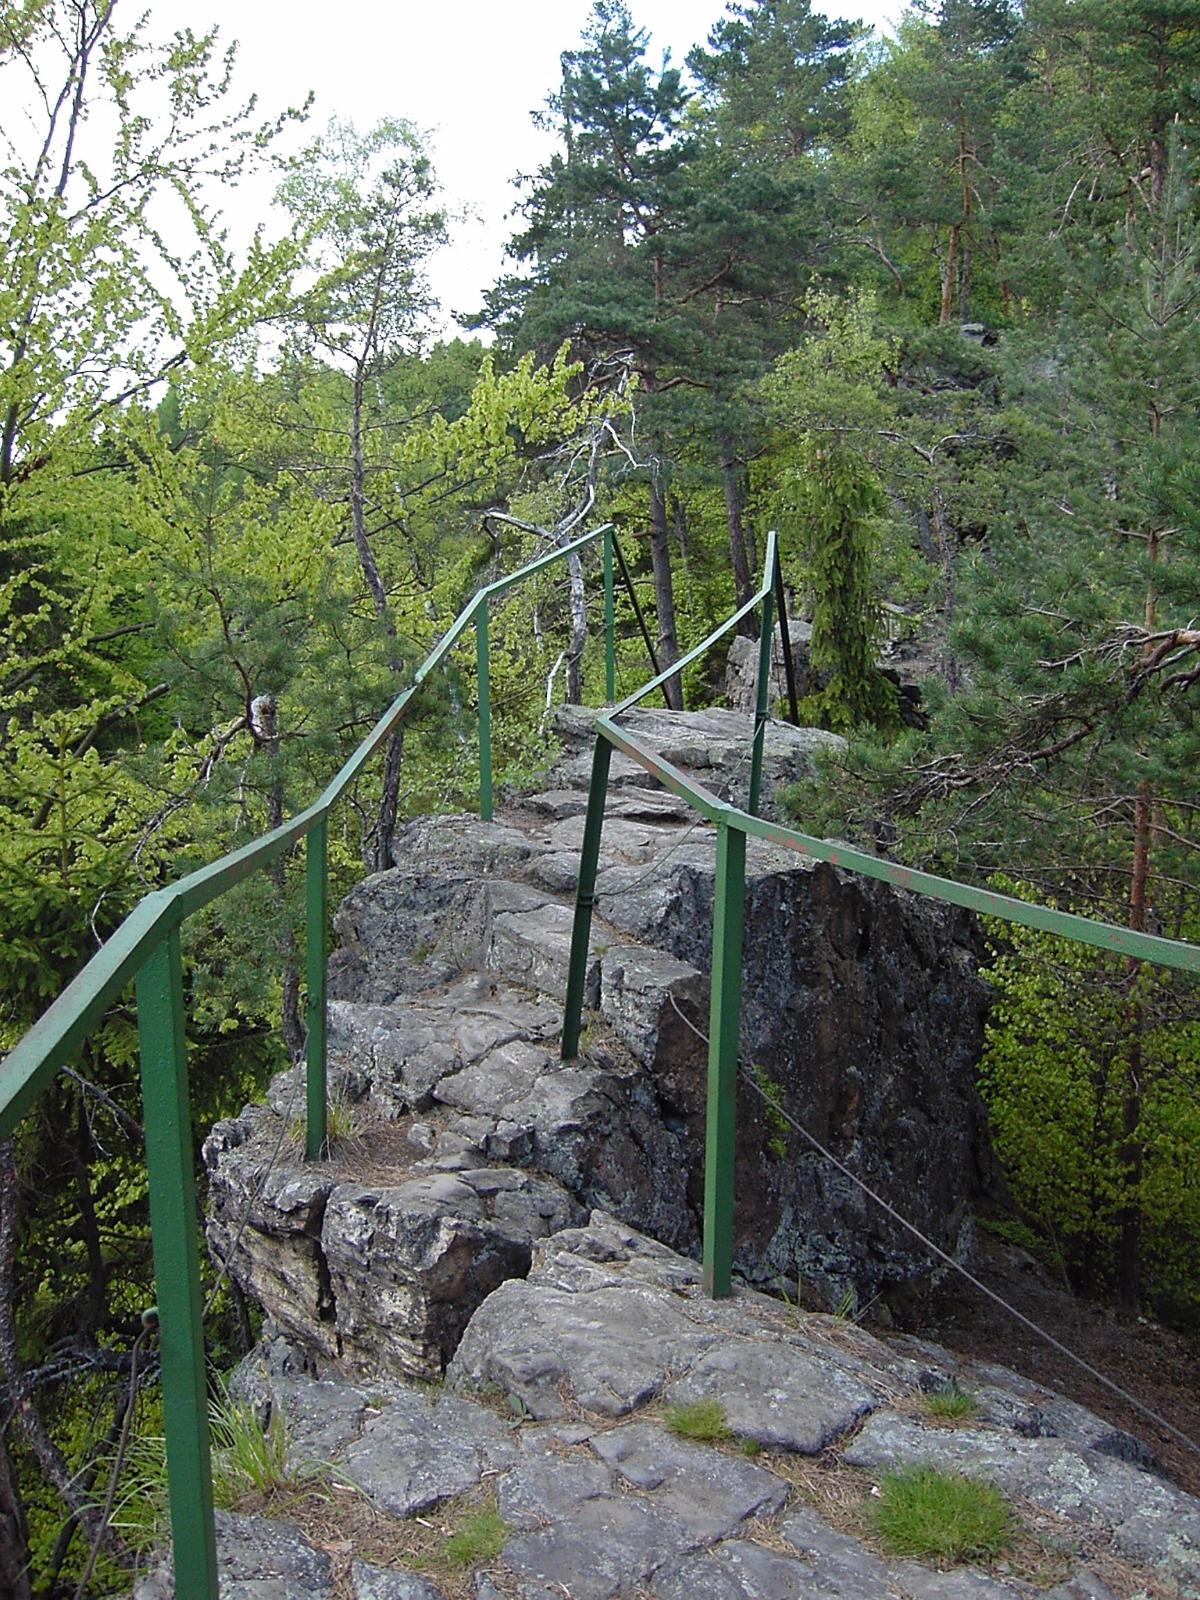 Zaniklý hrad a vyhlídka Sokolohrady